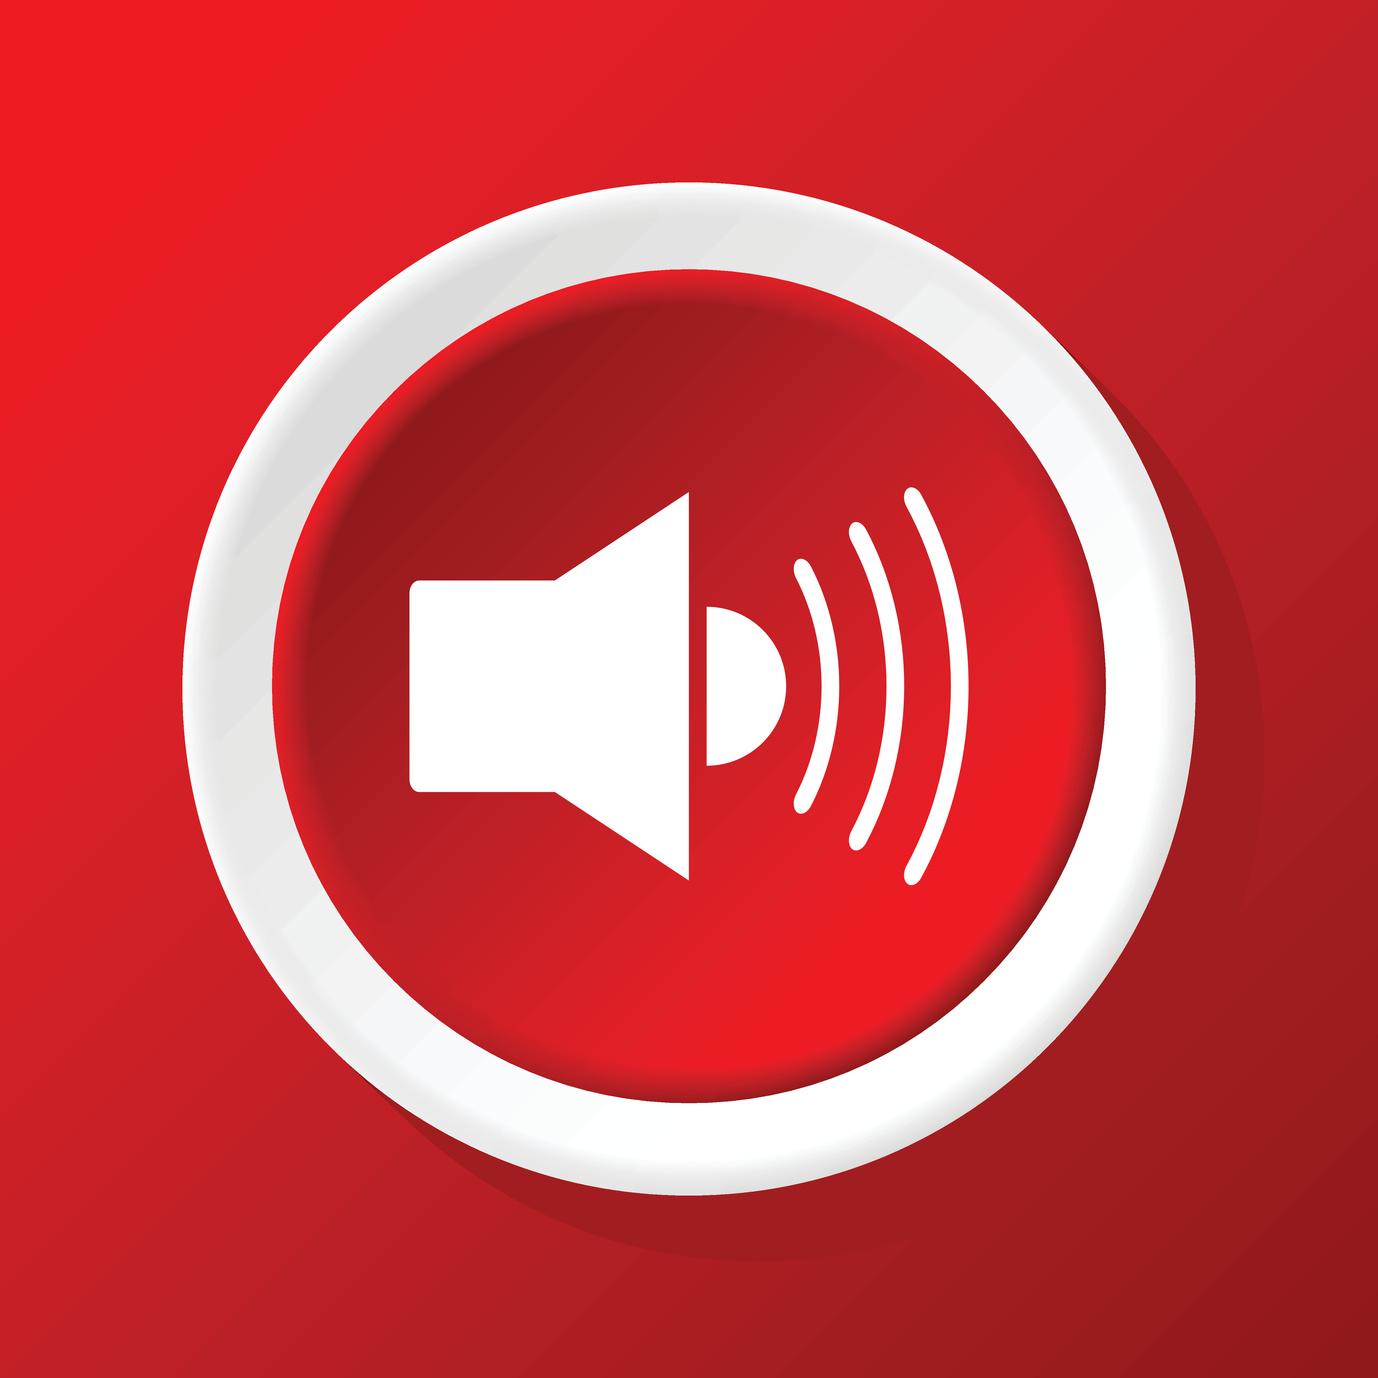 radio_listen_icon.jpg